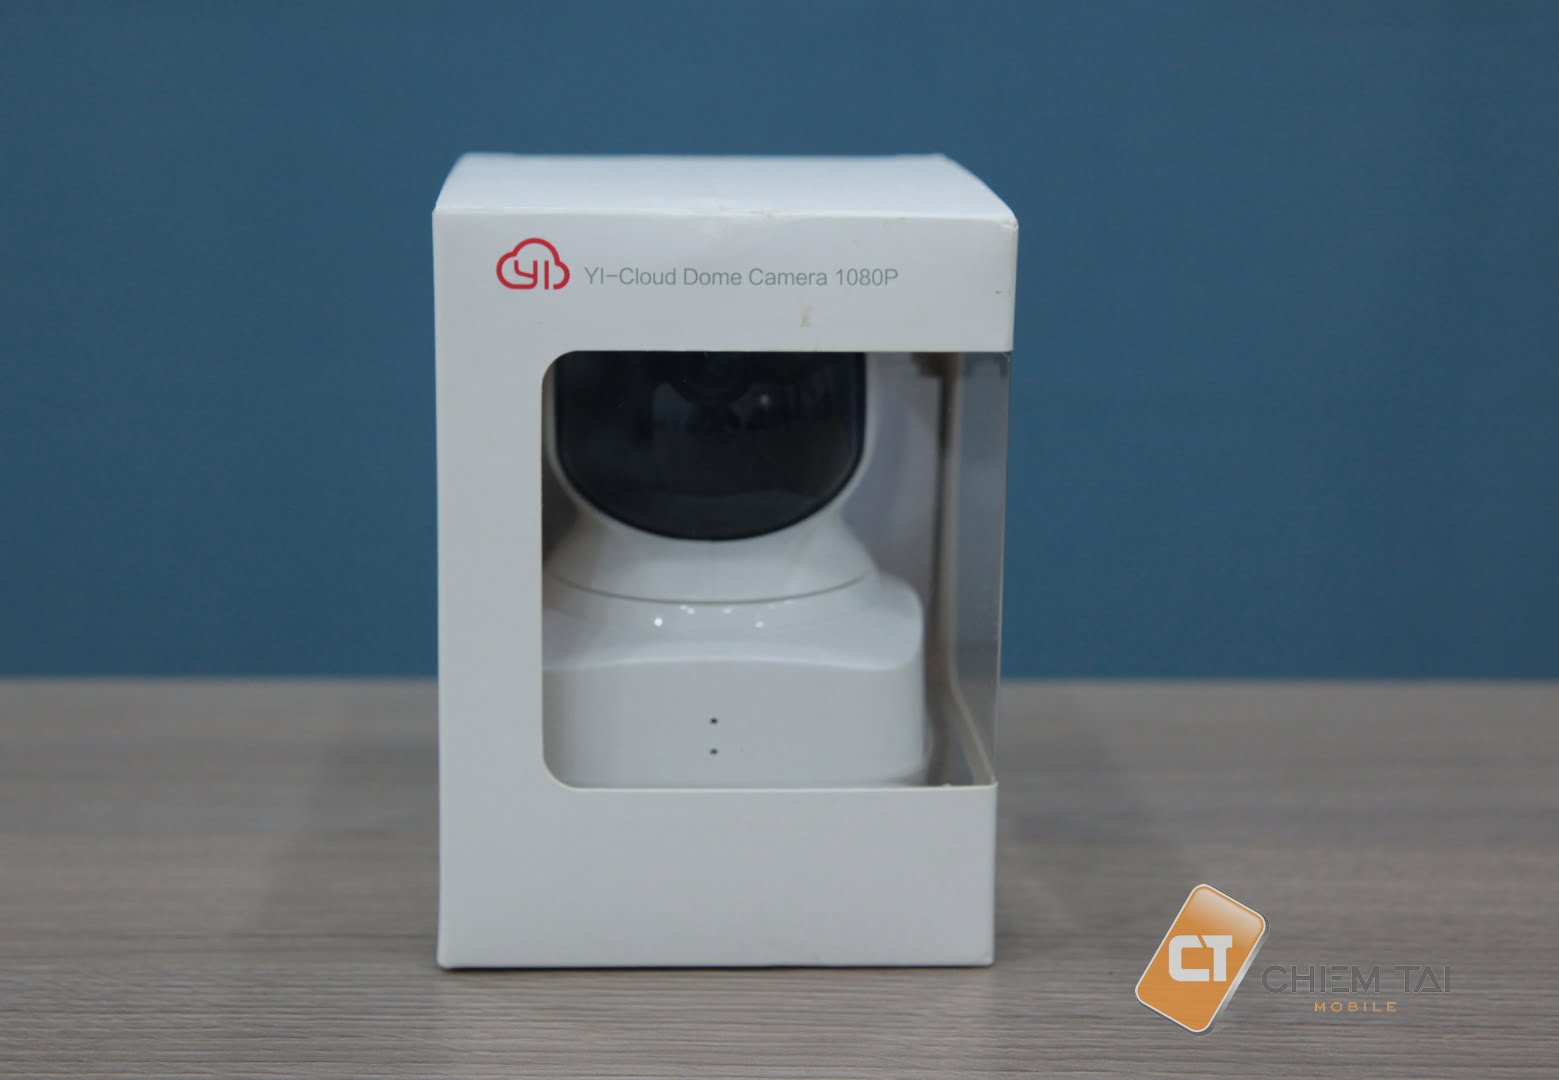 camera ip giam sat yi cloud dome 1080p 6007d3337e46c